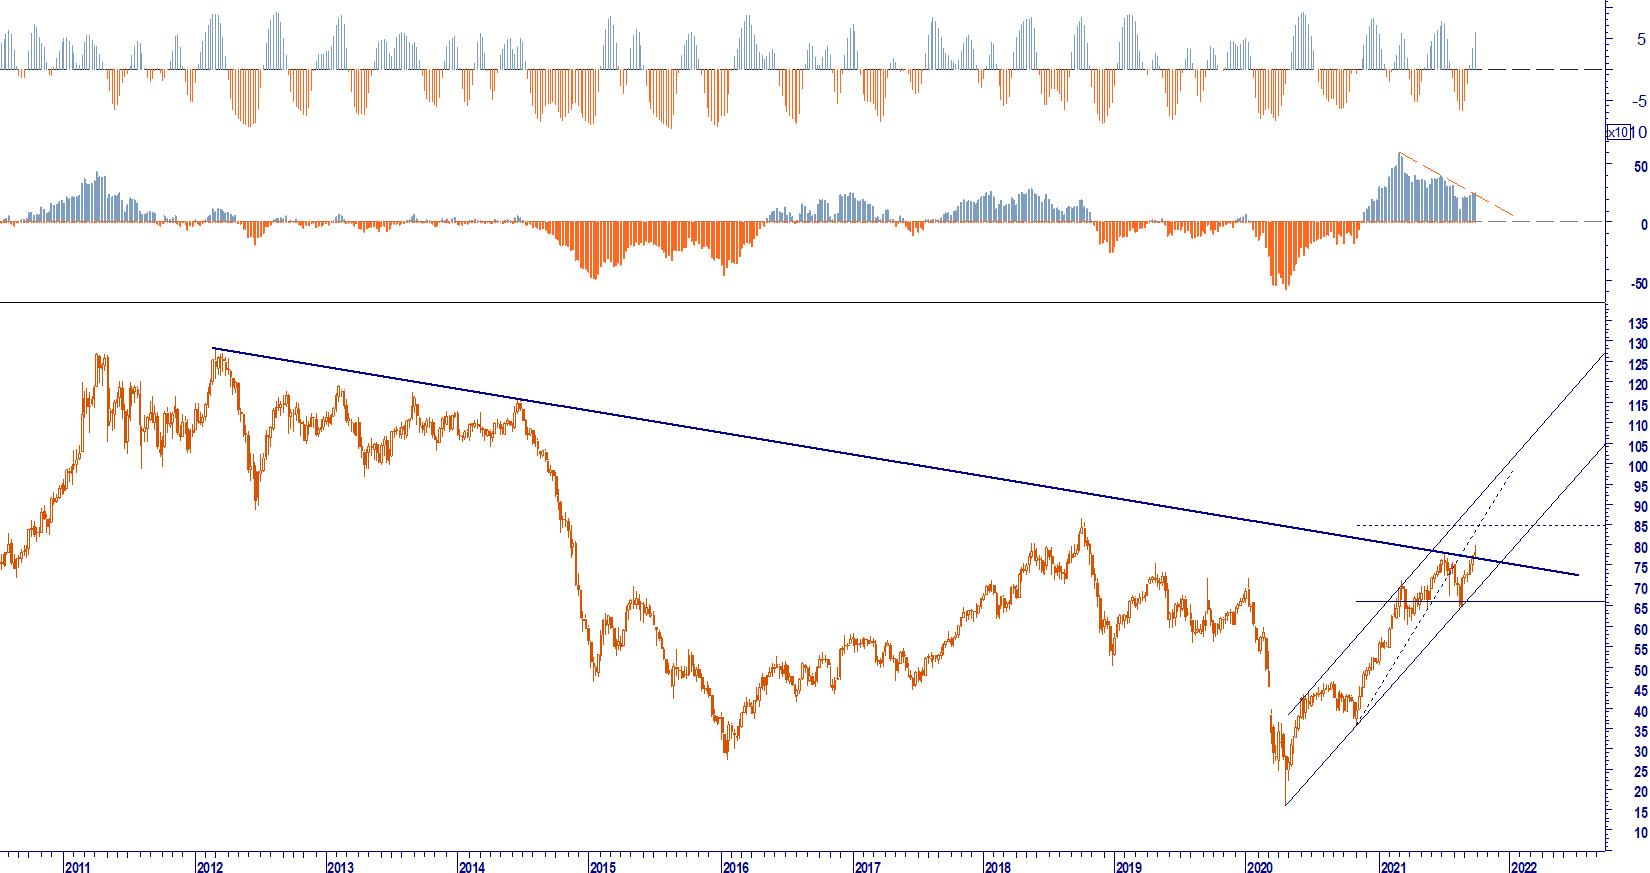 WB ANALYTICS: BRENT OIL USD BAR